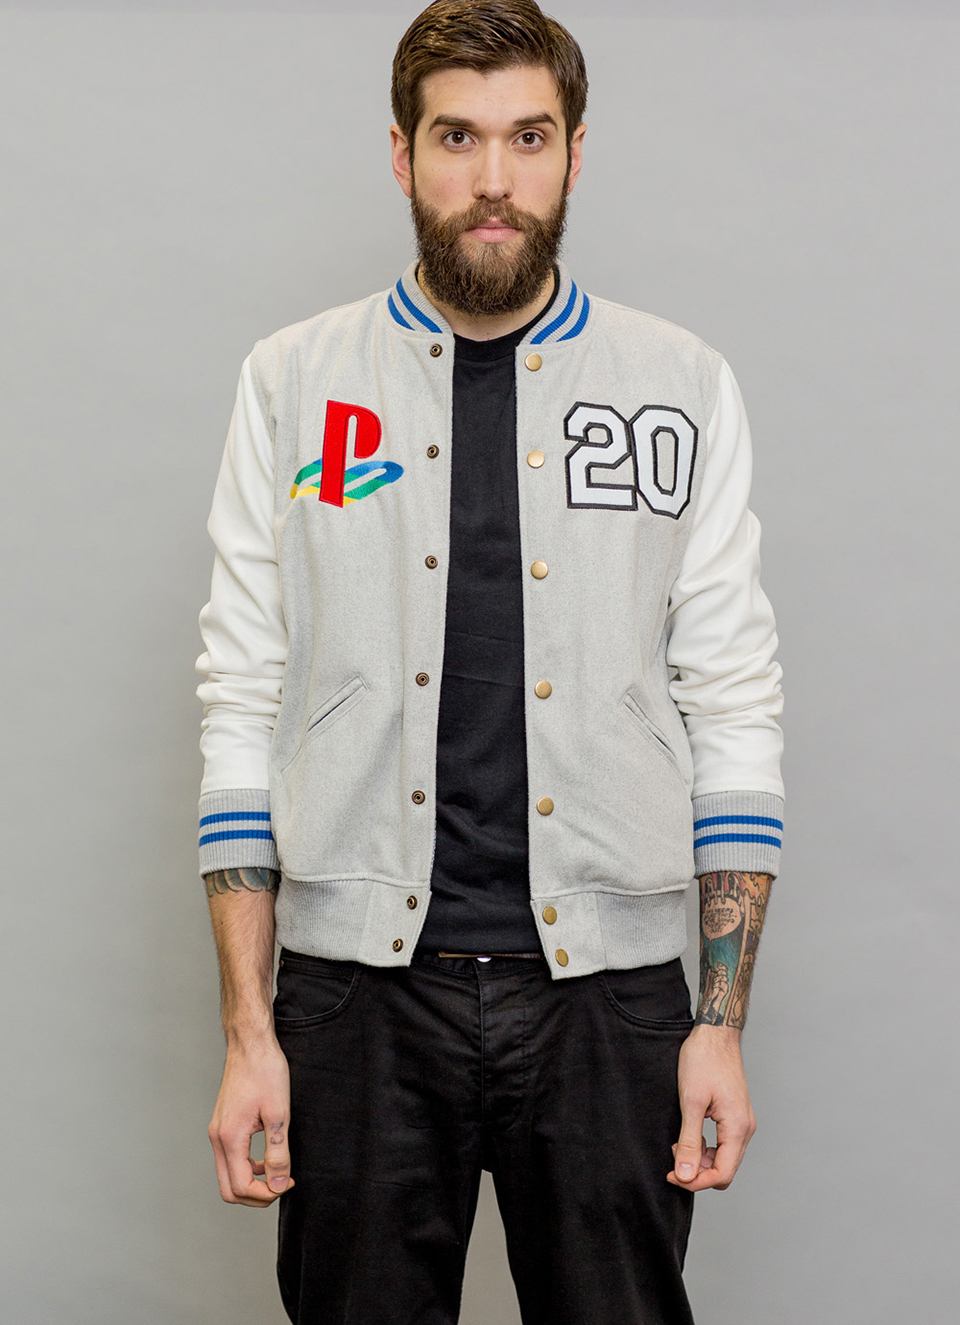 PlayStation 20th Anniversary Clothing